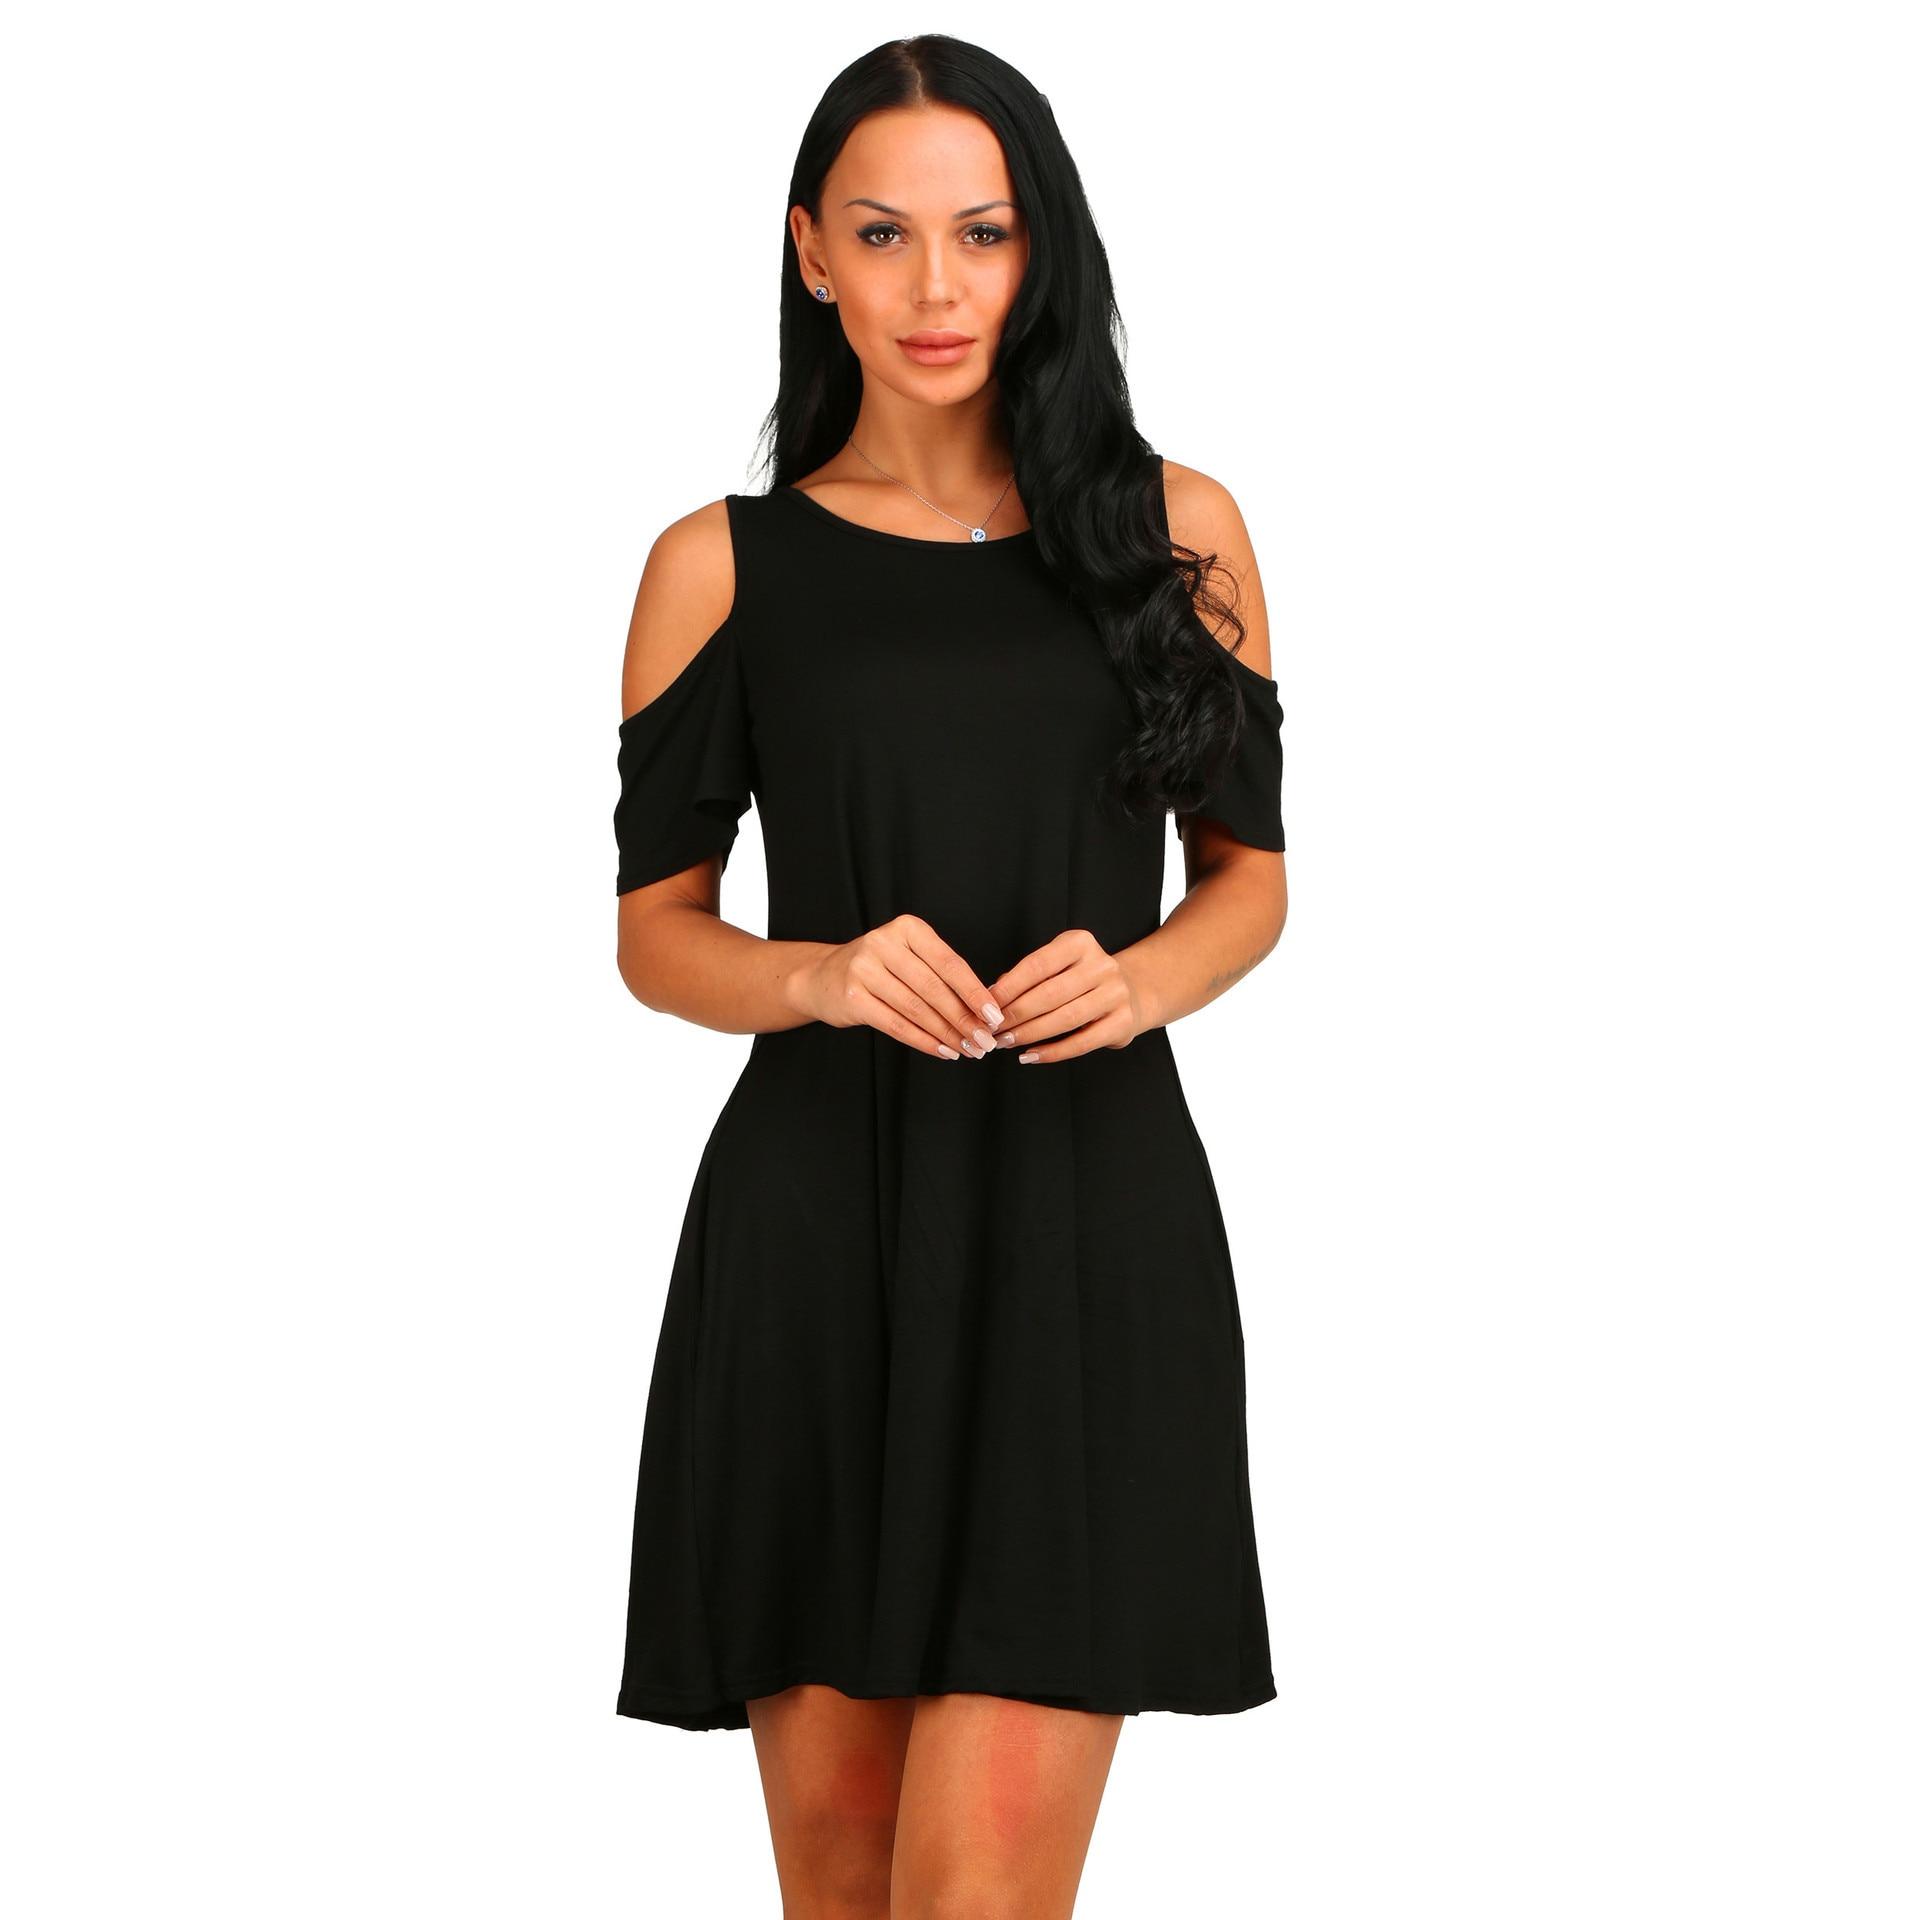 Women Short Sleeve Off Shoulder Dress 2020 O-Neck Knee Length Dress Thin Spring Female Vestidos De Fiesta With Pocket